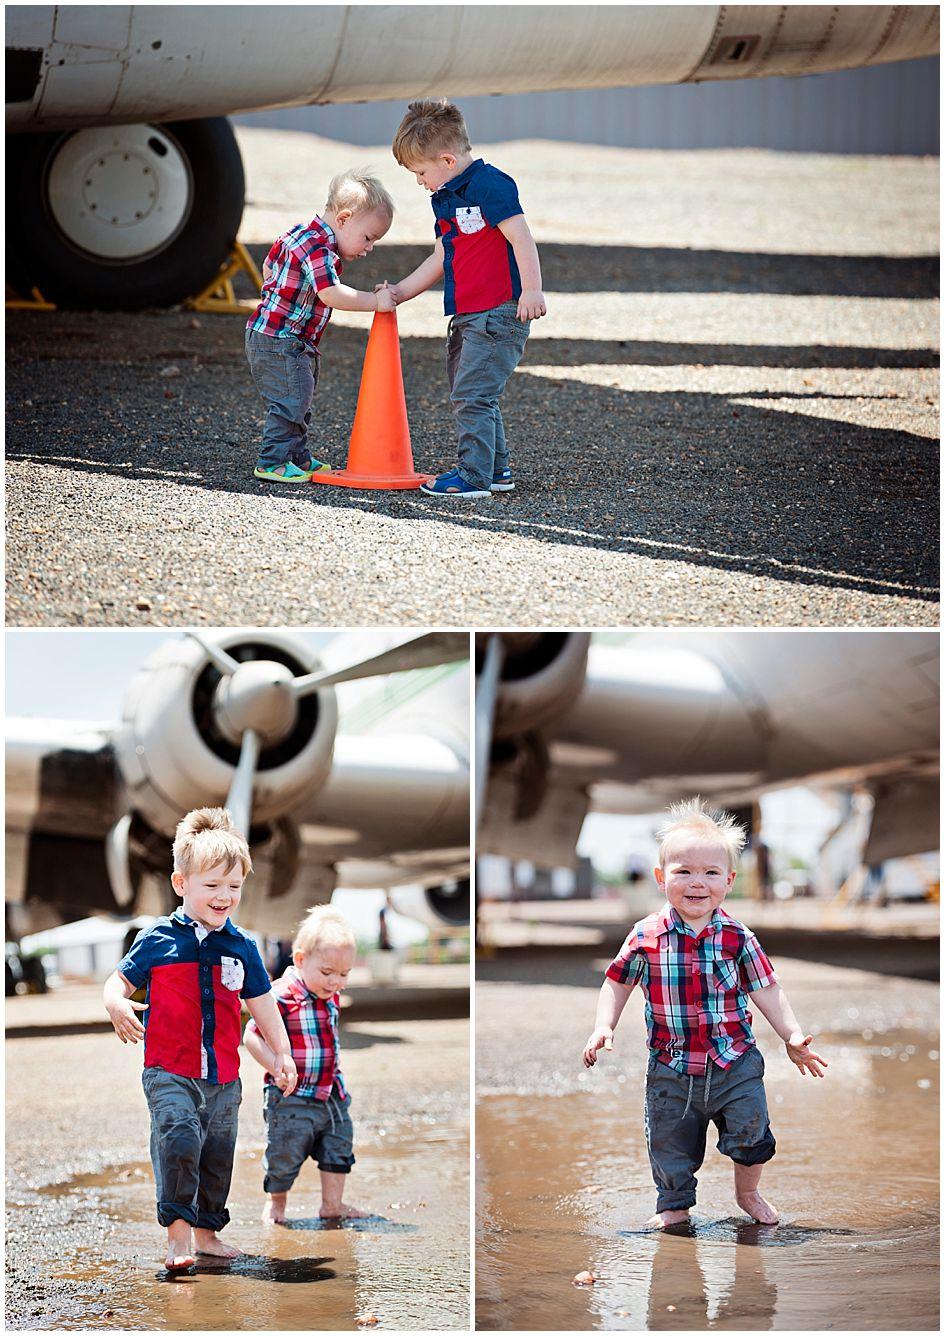 playful-brothers-aeroplane-shoot.jpg